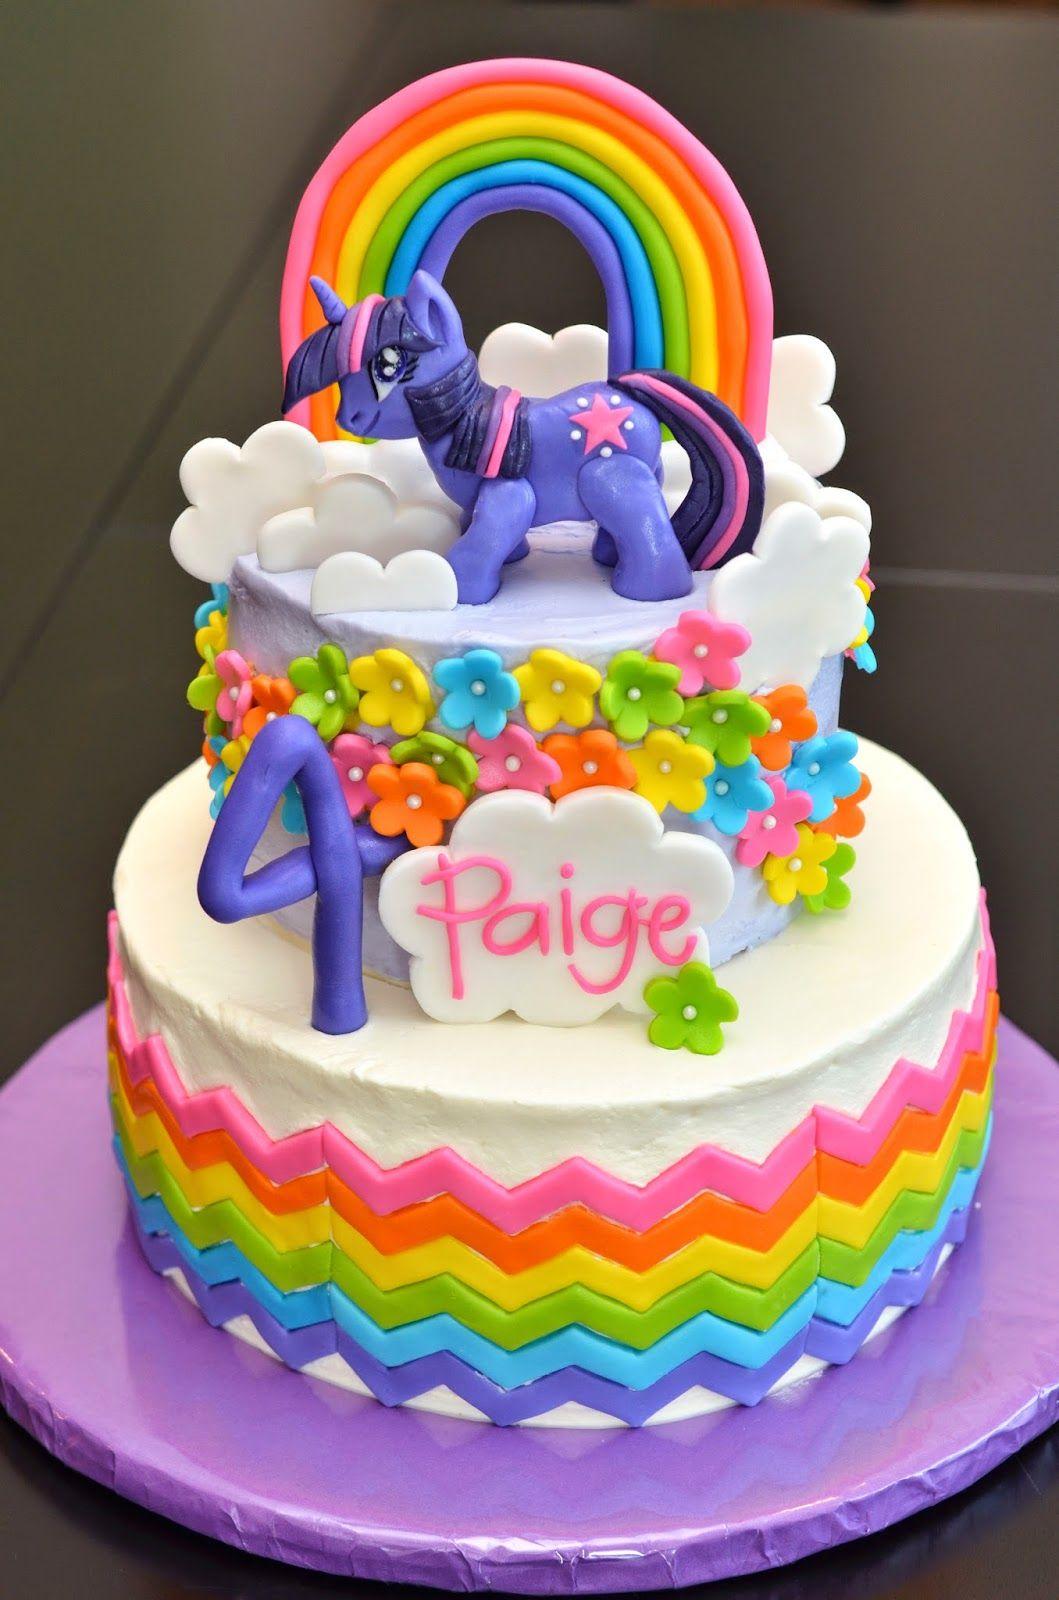 Twilight Sparkle Birthday Cakes Google Search My